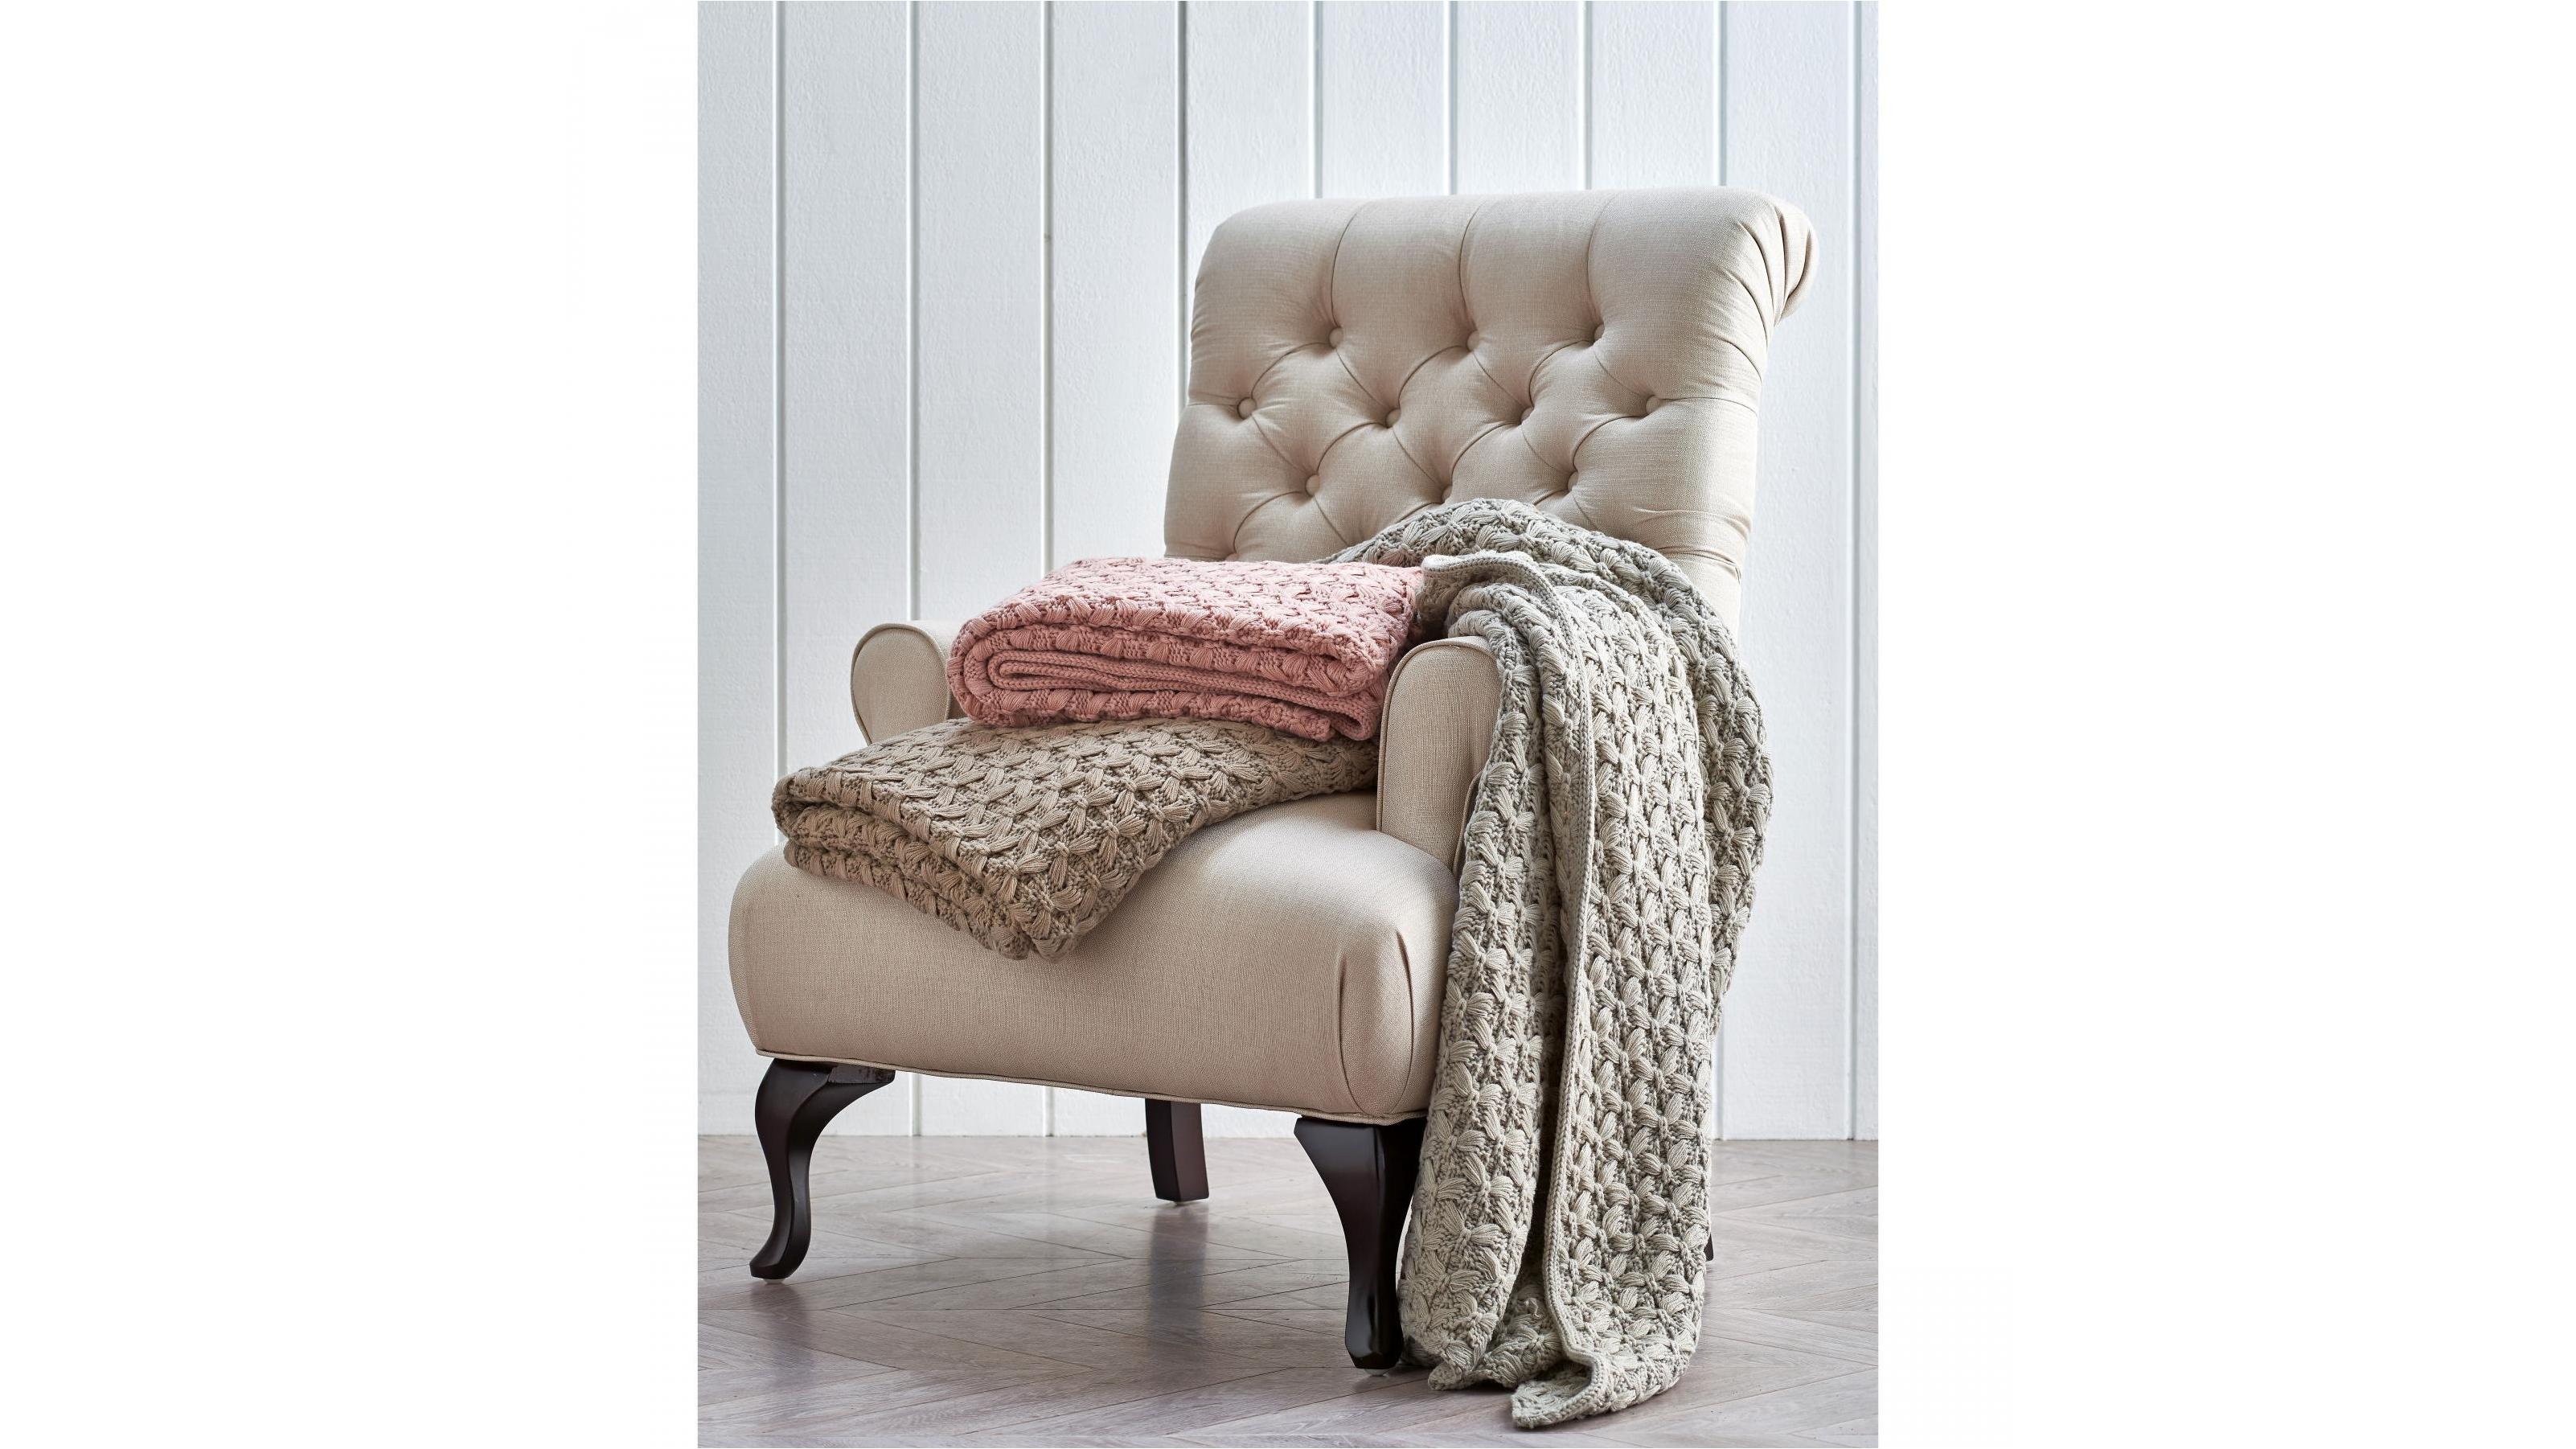 Buy Beatrice Bedroom Chair  Harvey Norman AU